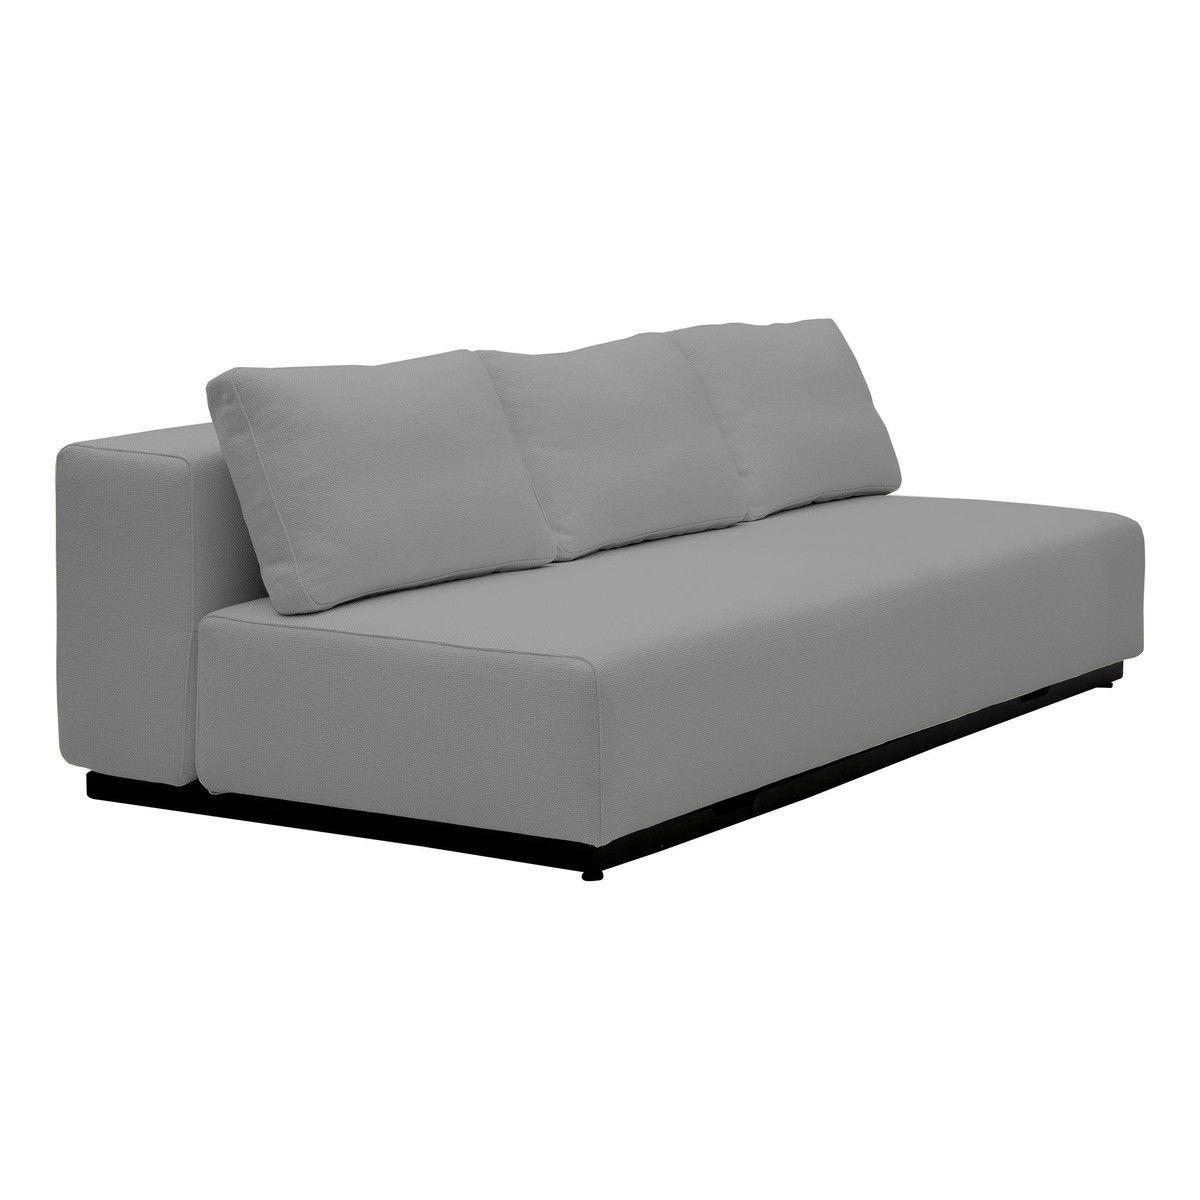 Nevada 3 p sofa bed softline - Gelbe couch ...